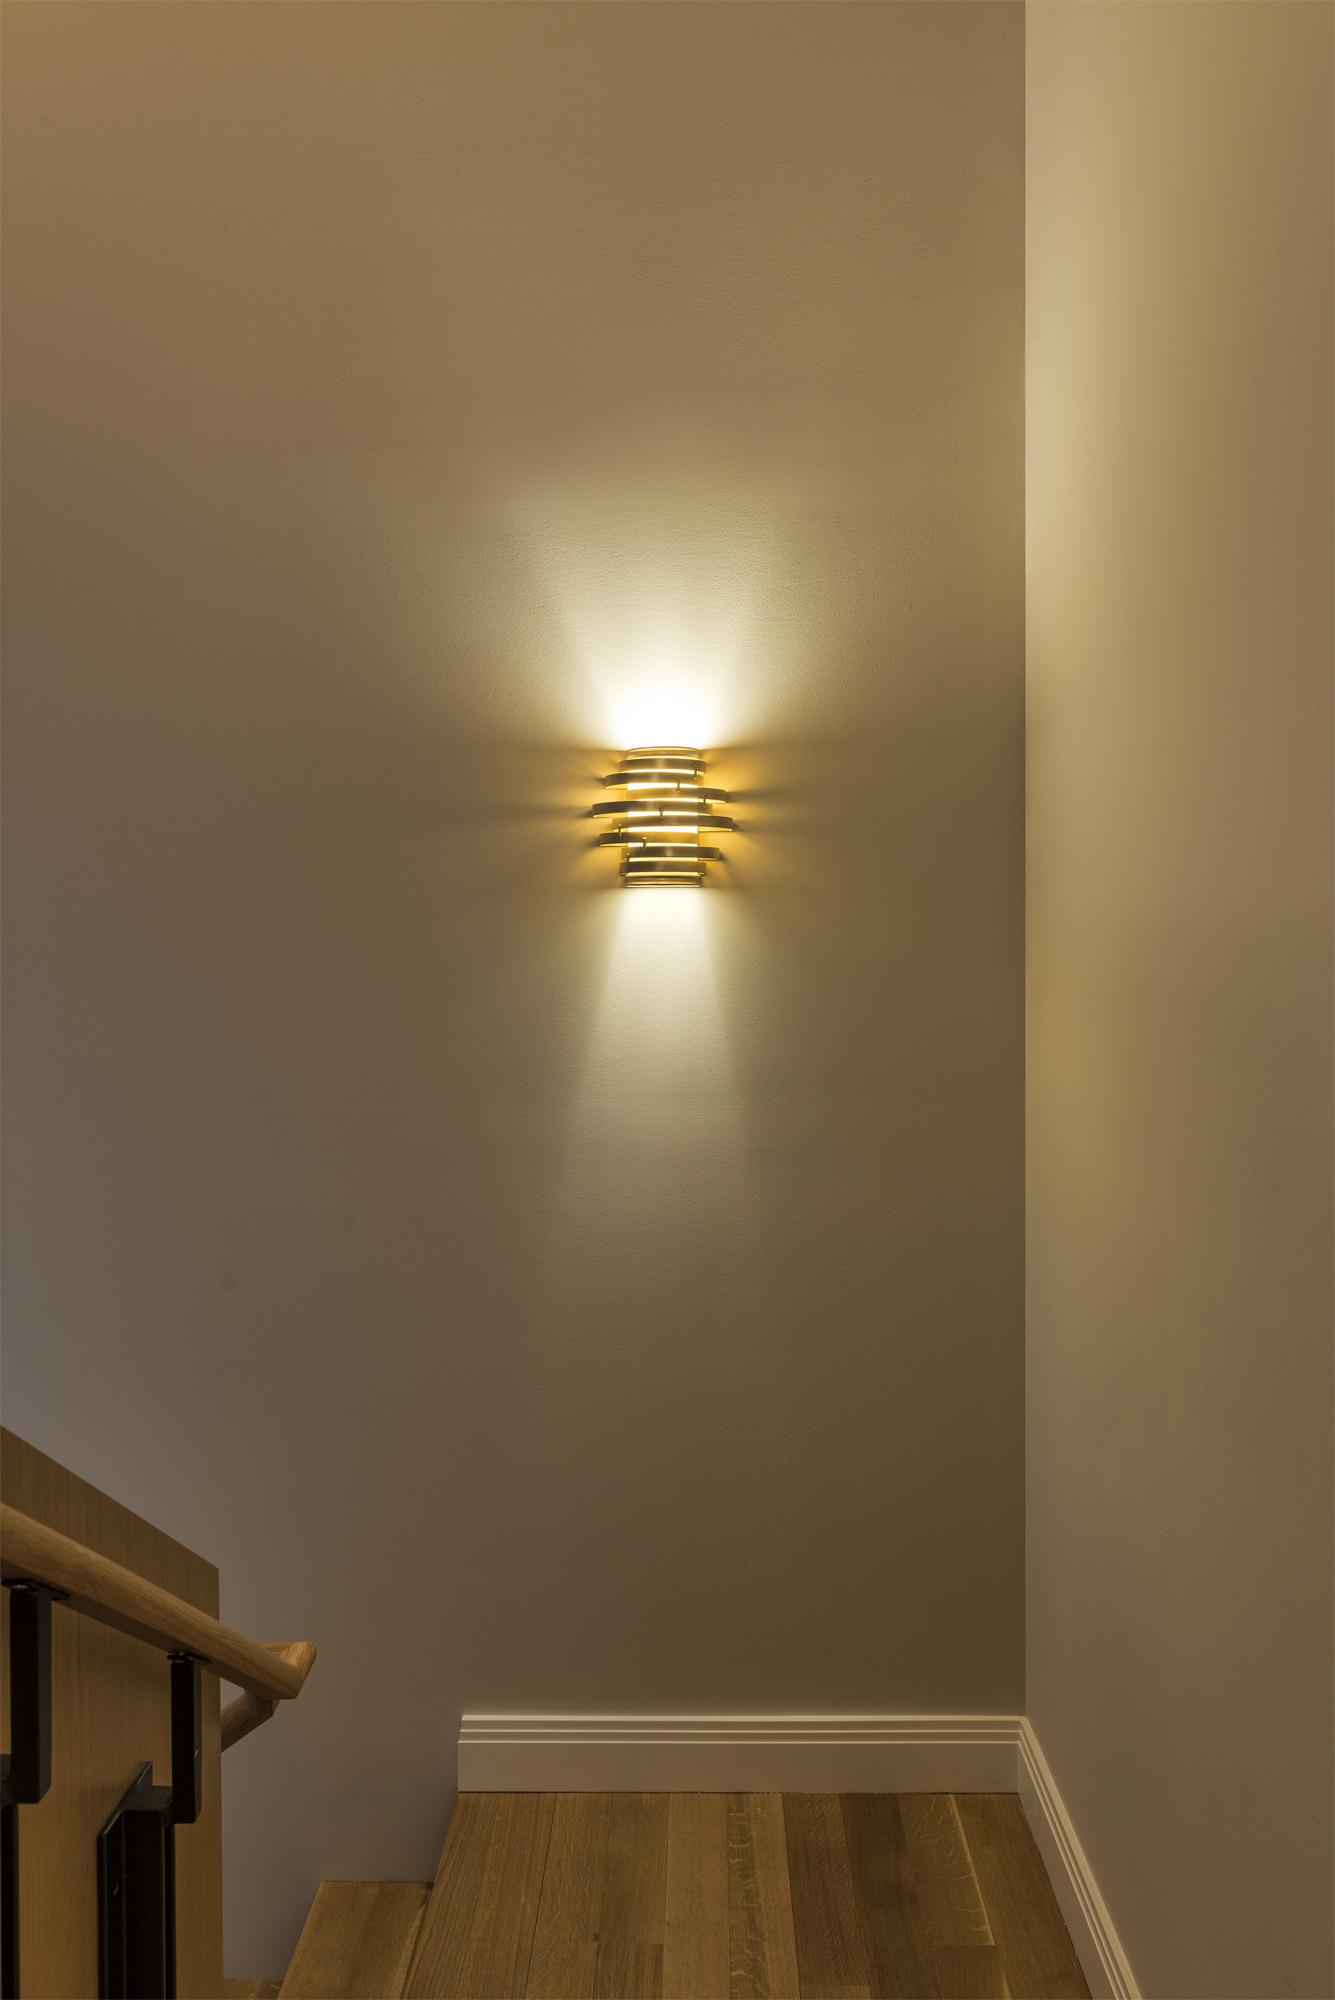 Installation Gallery | Stairway Lighting | Wall Lighting